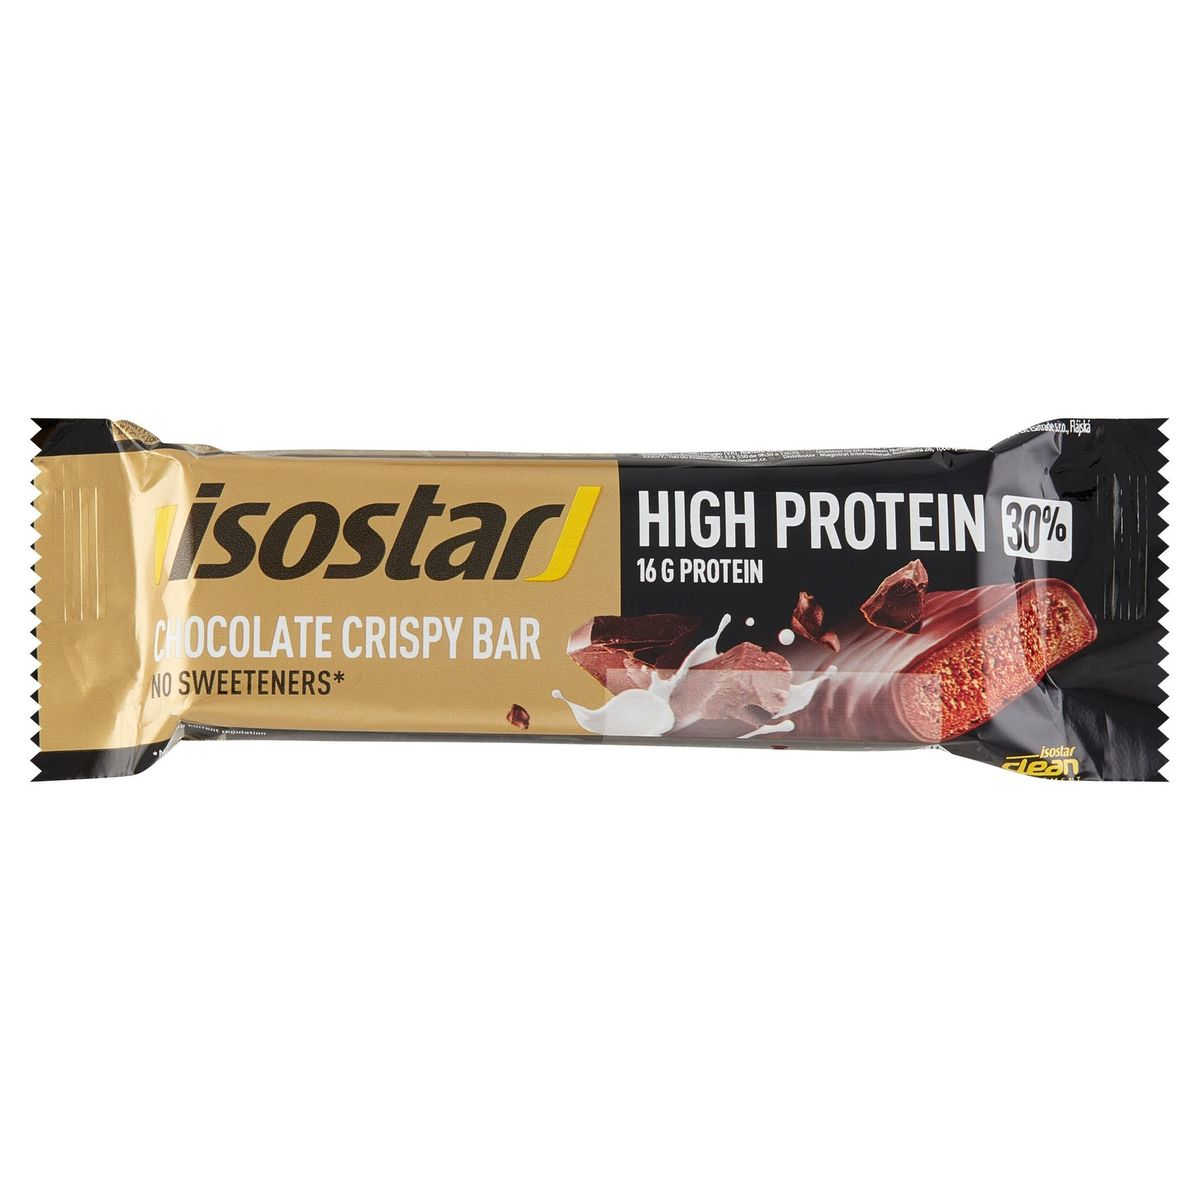 Isostar High Protein 30% Chocolate Crispy Bar 55 g